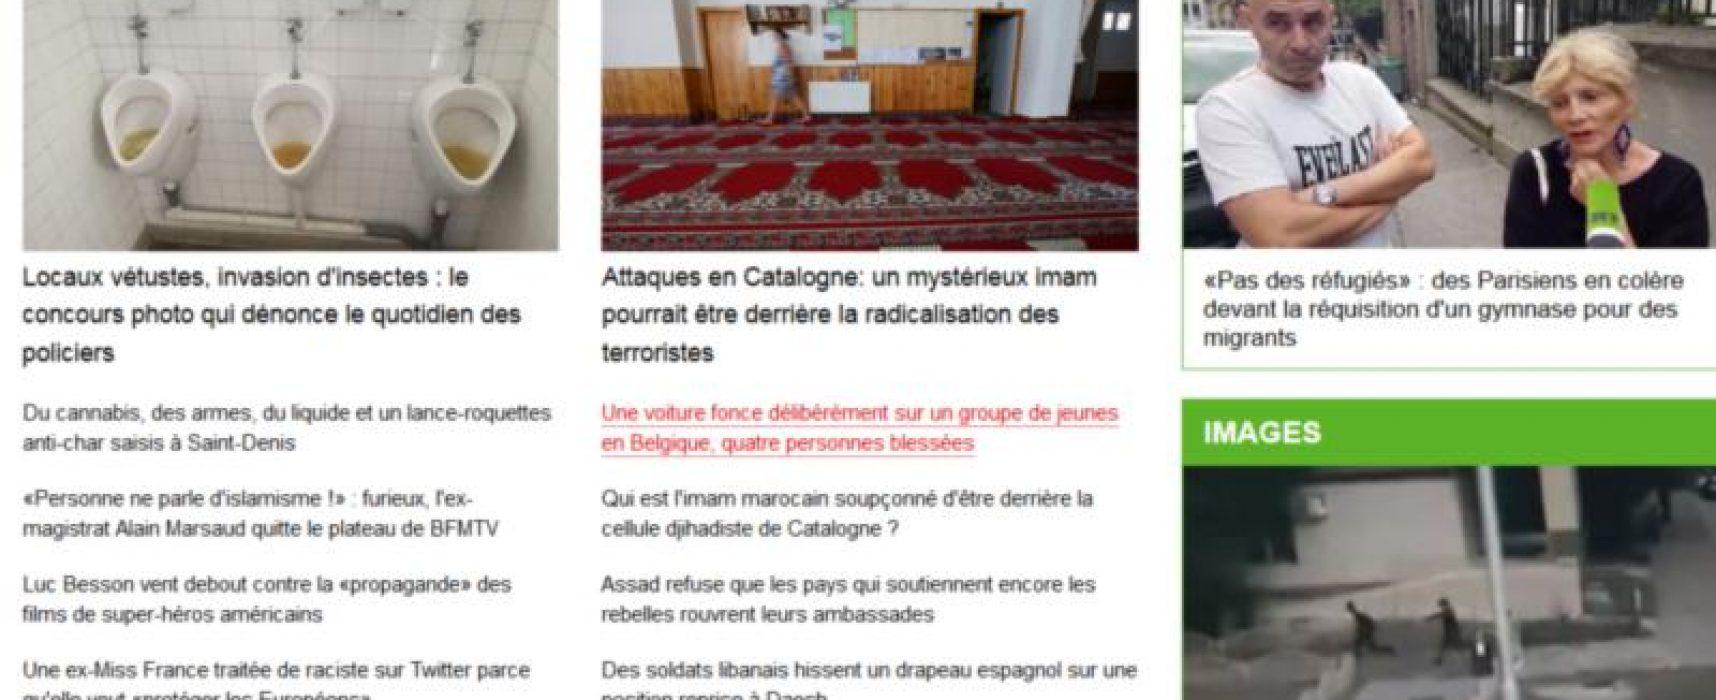 La propagande russe aura sa chaîne en français d'ici 2018